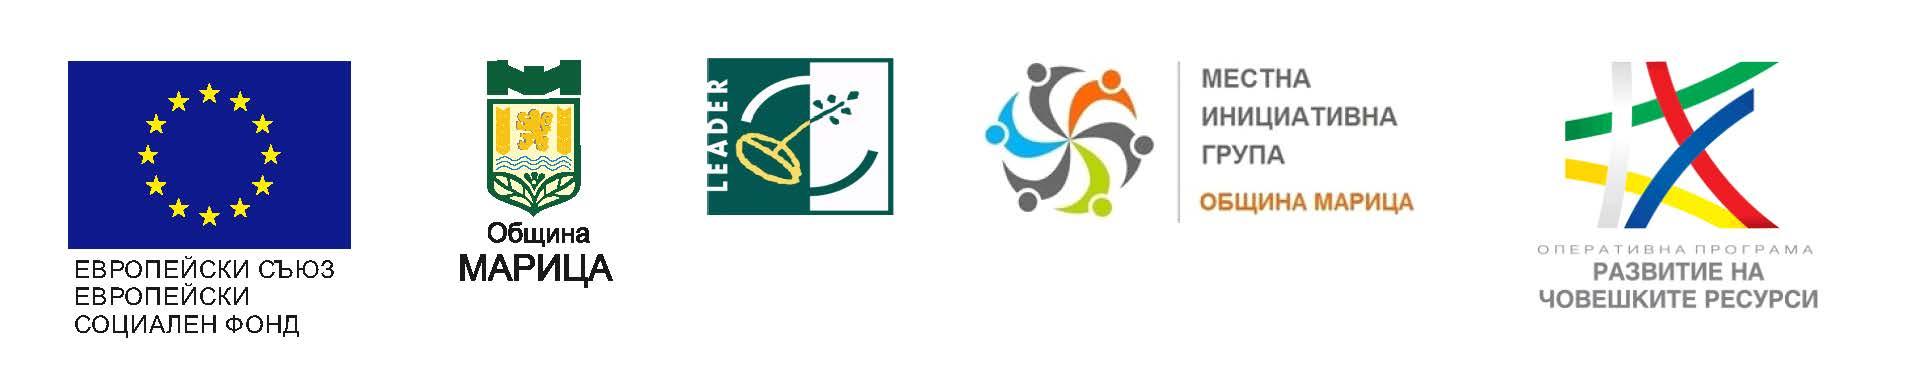 Logo public